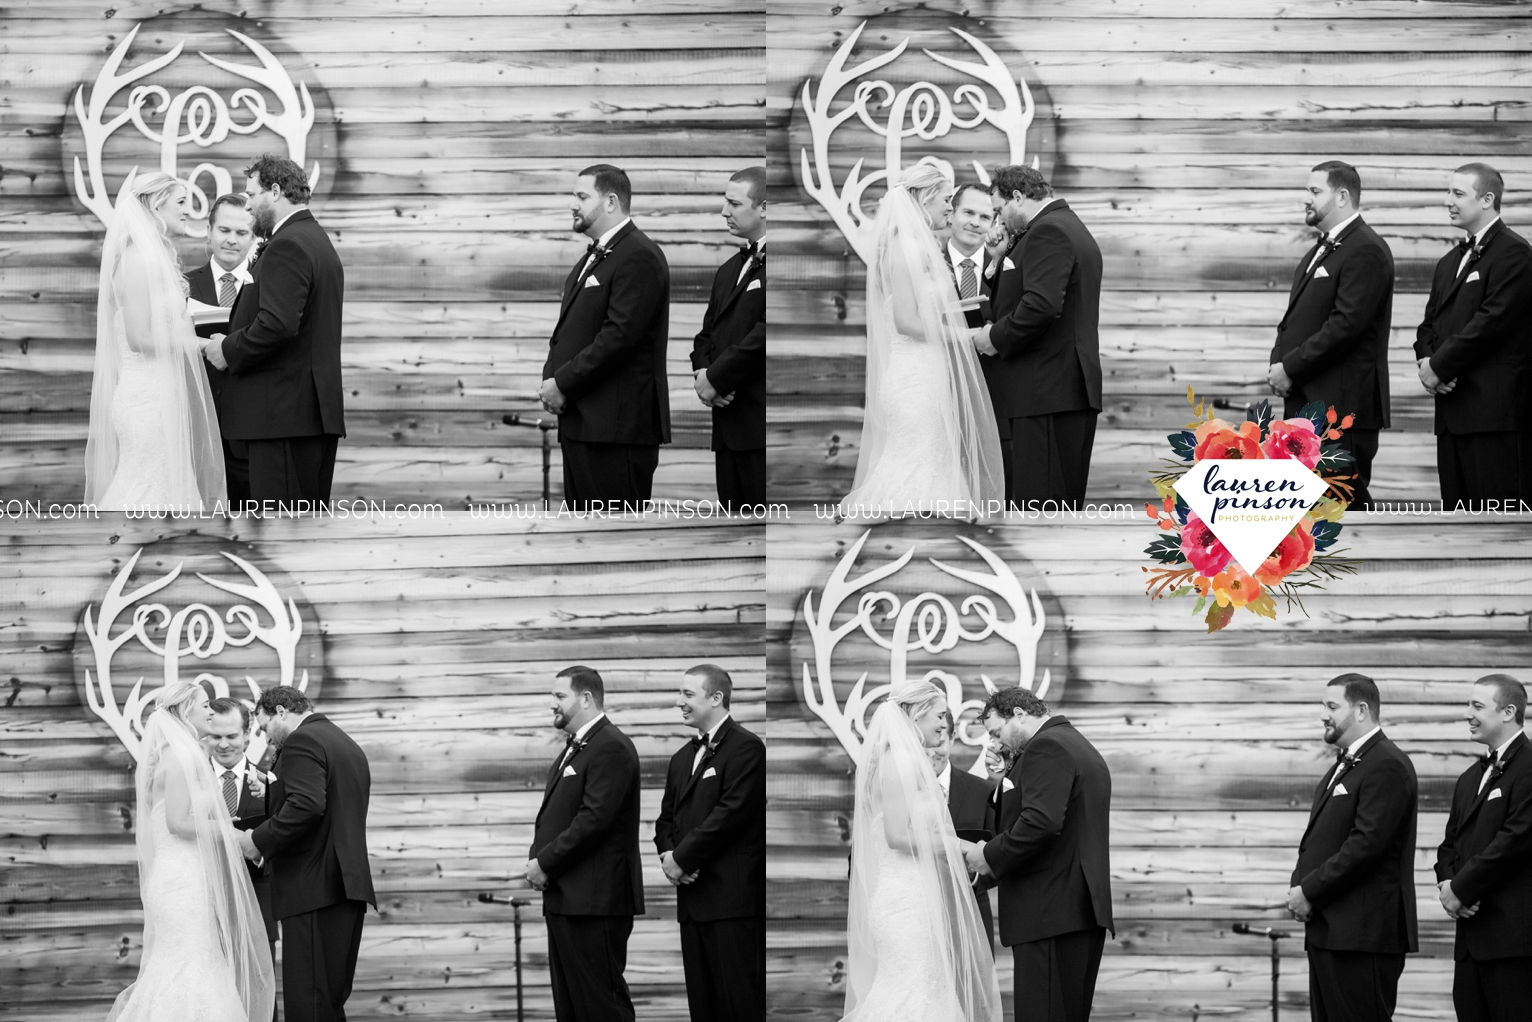 rustic-wichita-falls-texas-wedding-photographer-gold-glam-mayfield-events-market-street-united-allue-bridals-fall_1687.jpg